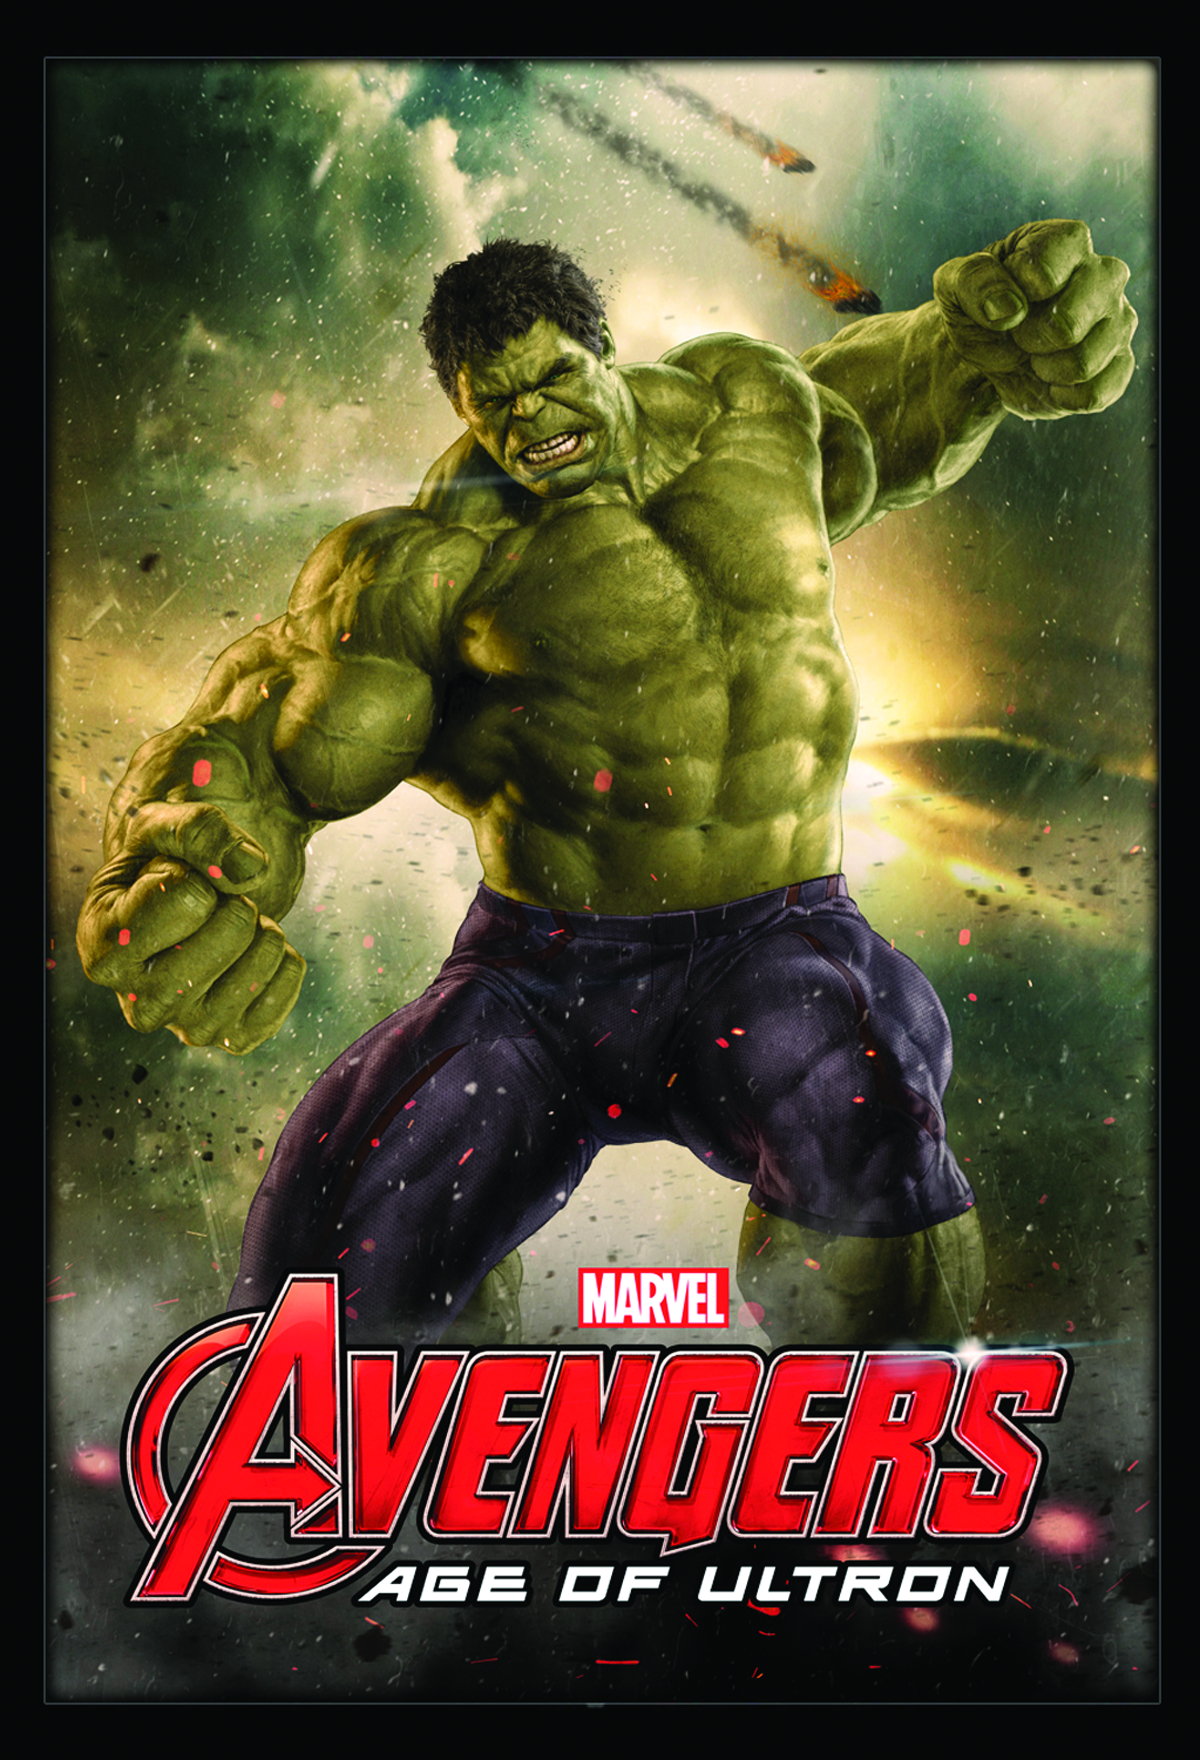 Avengers Assemble - Hulk Cartoon Face Transparent PNG ...  |Incredible Hulk Face Avengers